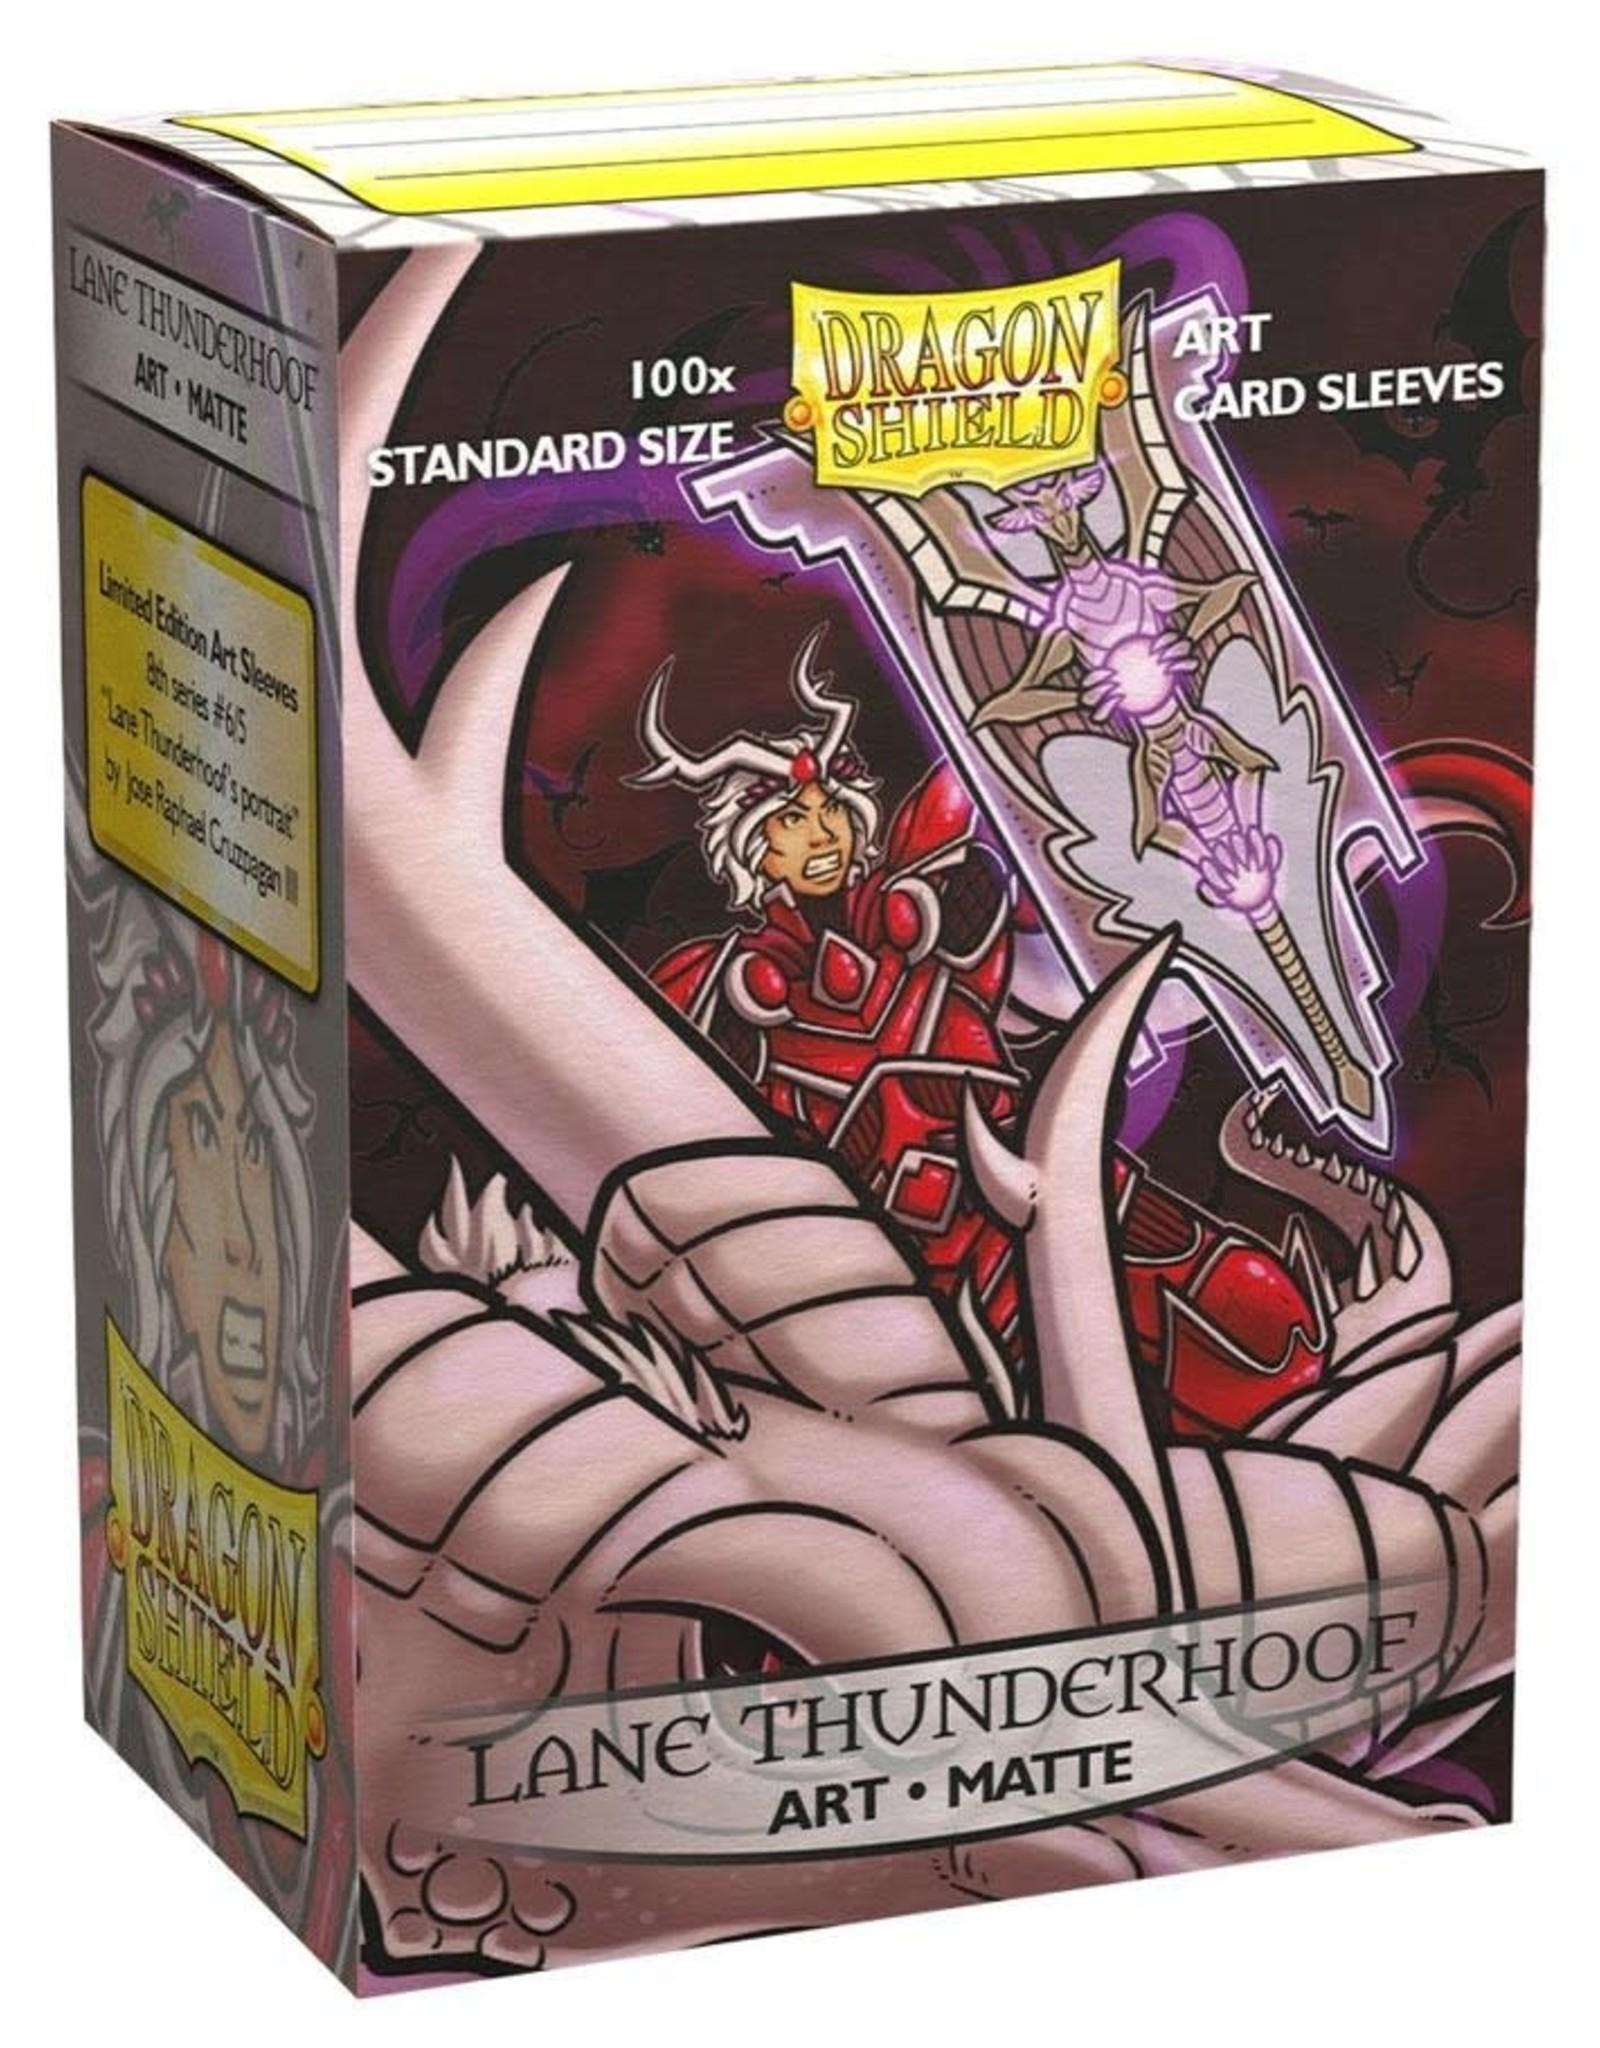 Dragon Shields Matte Art (Lane Thunderhoof) (100 Count)